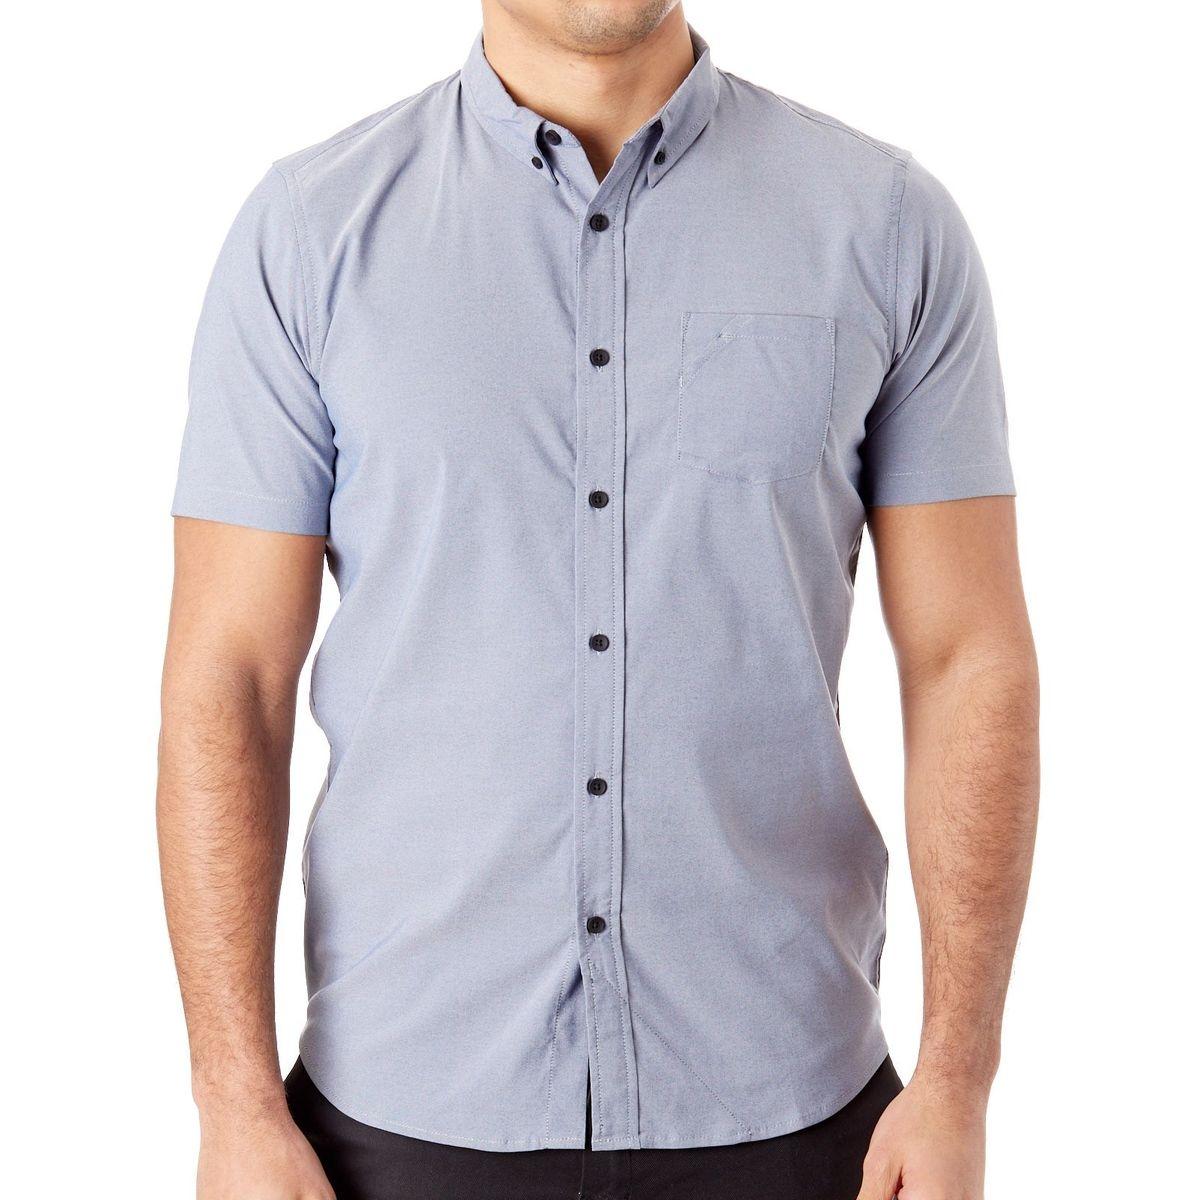 Chemise à manches courtes Solid Woven